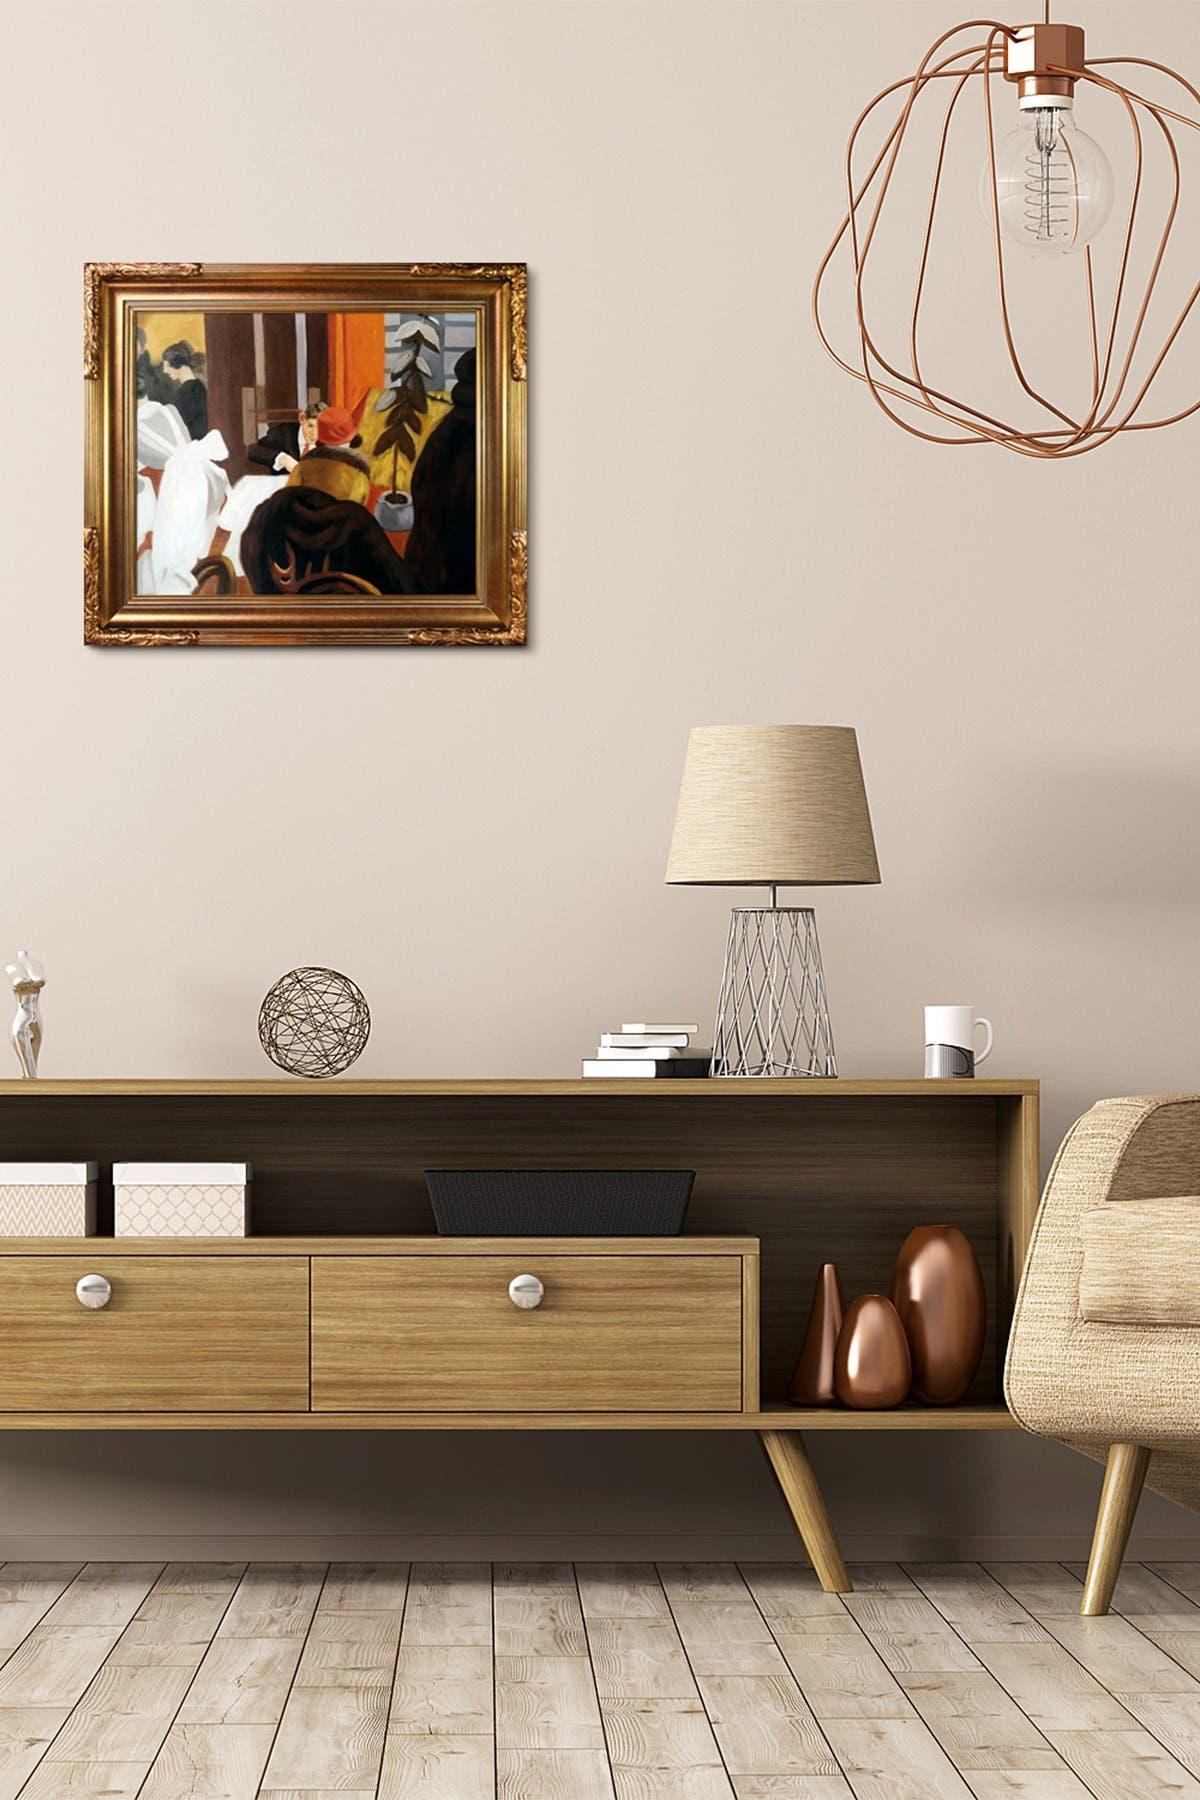 "Image of Overstock Art New York Restaurant Framed Oil Reproduction of Original Painting by Edward Hopper - 31""x27"""